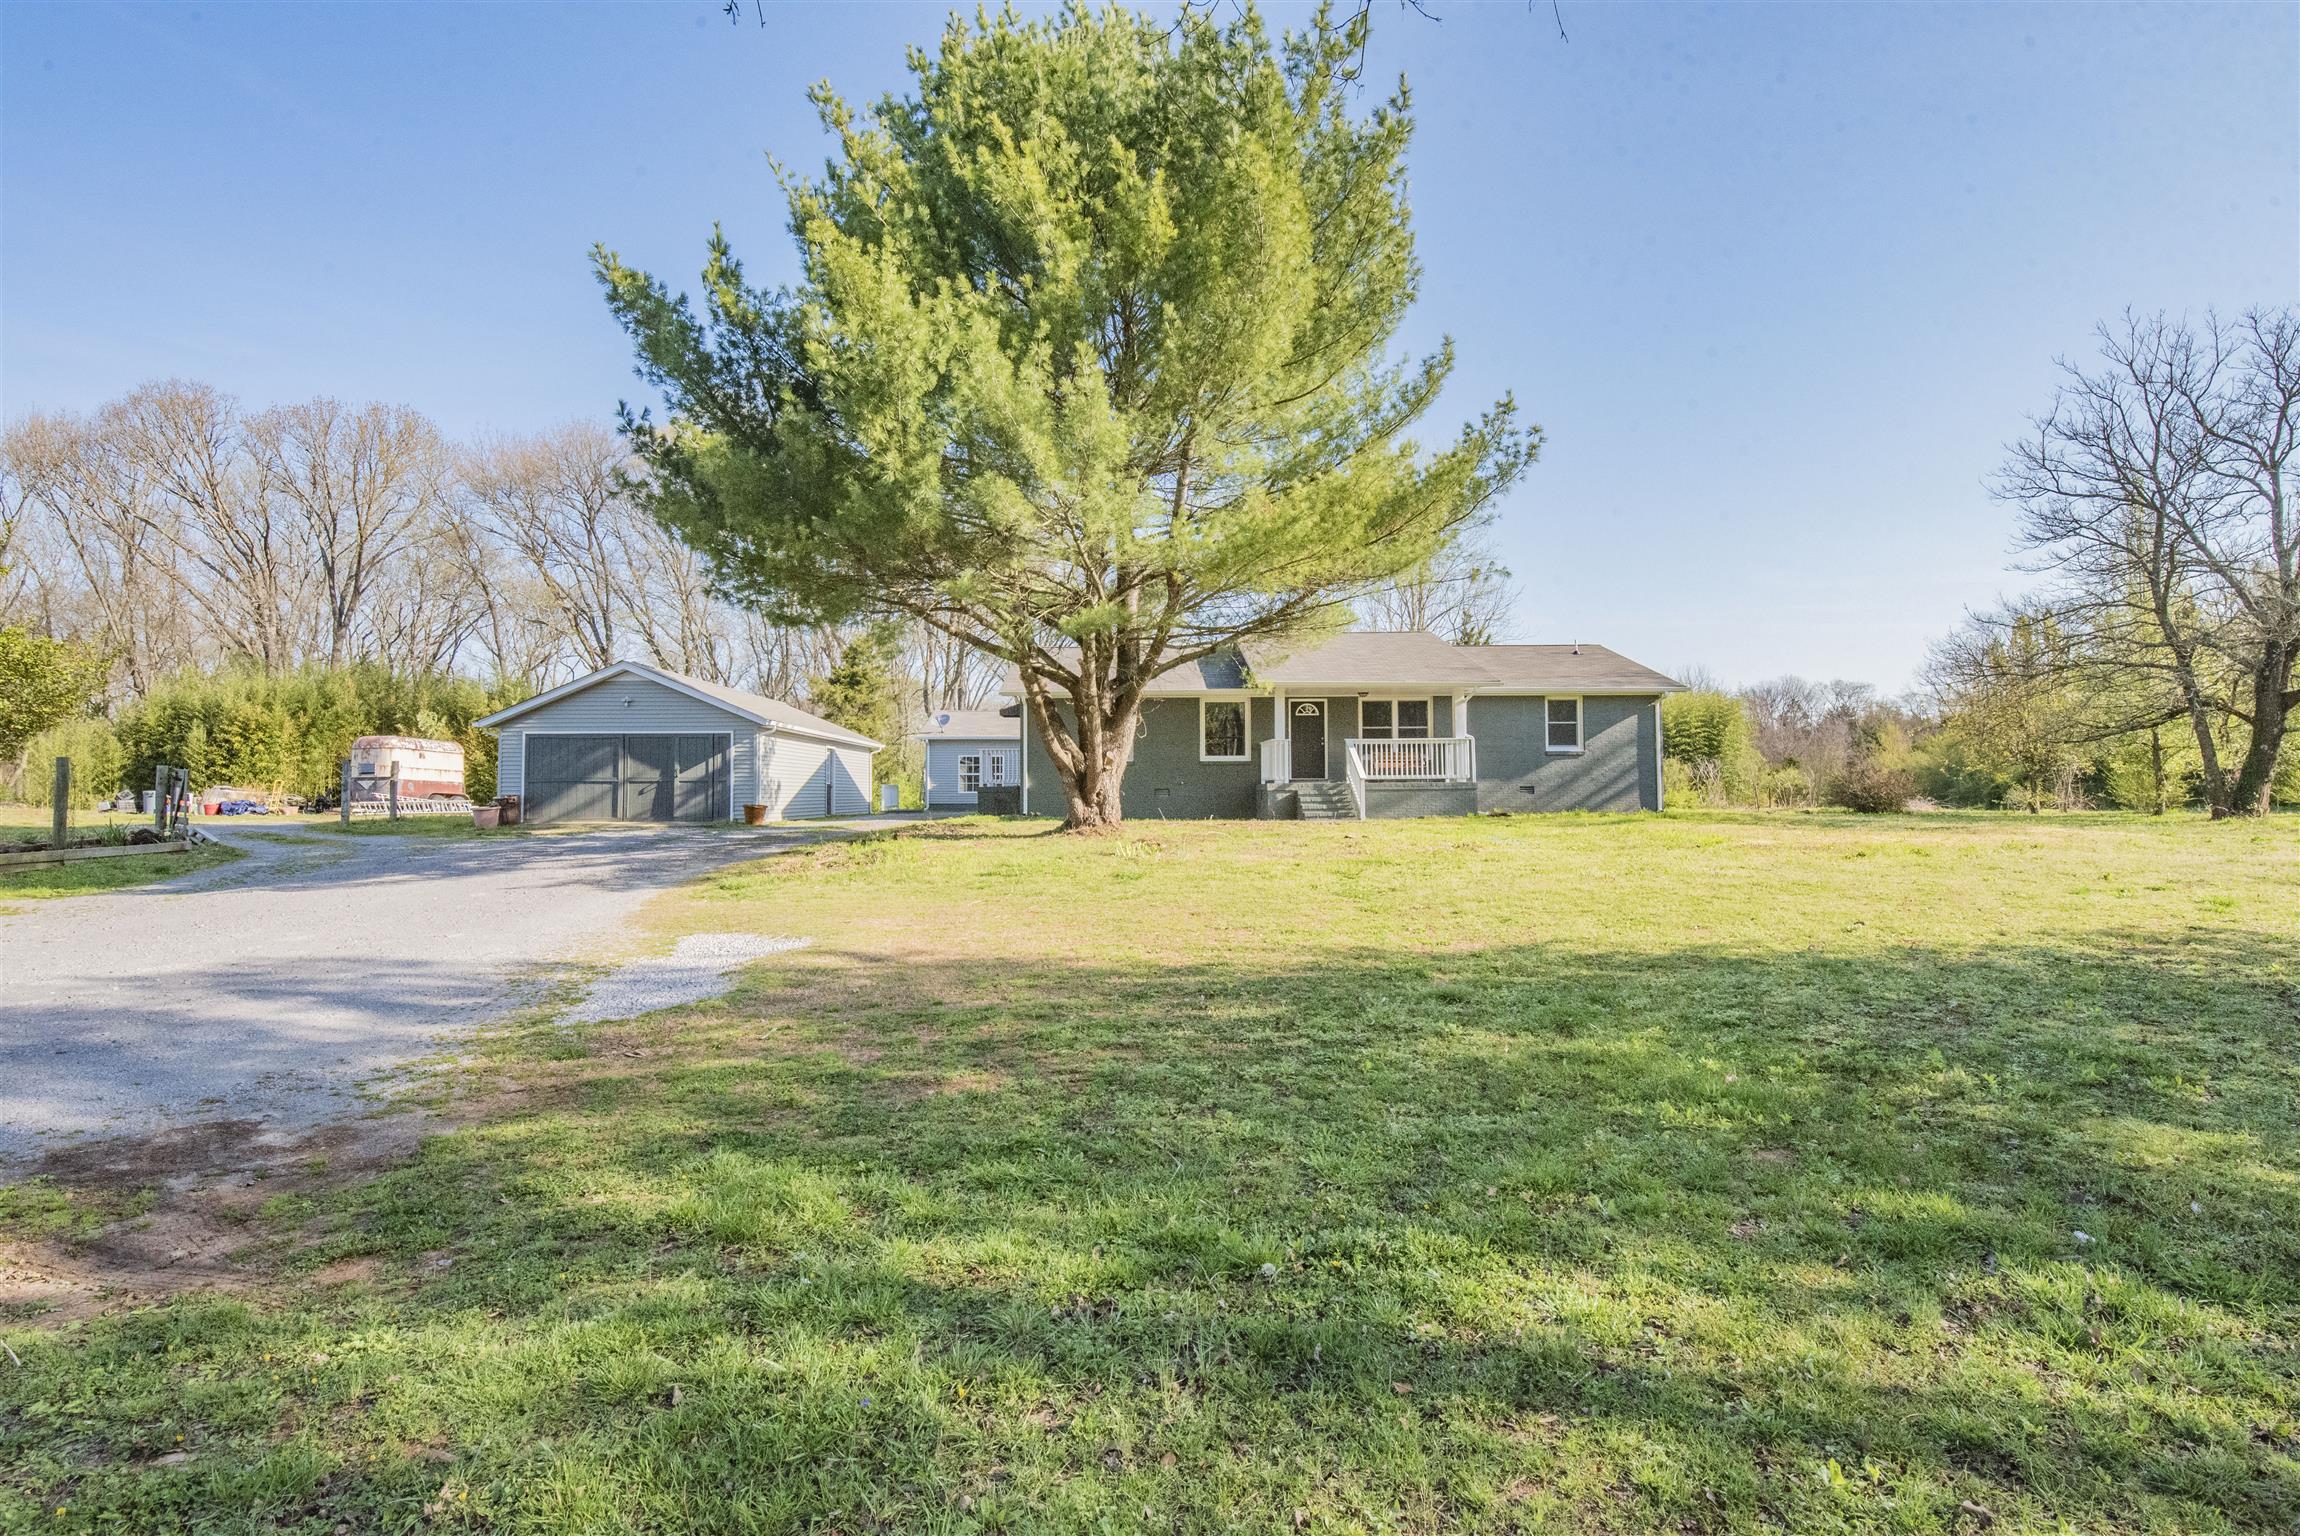 3065 Asbury Rd, Murfreesboro, TN 37129 - Murfreesboro, TN real estate listing